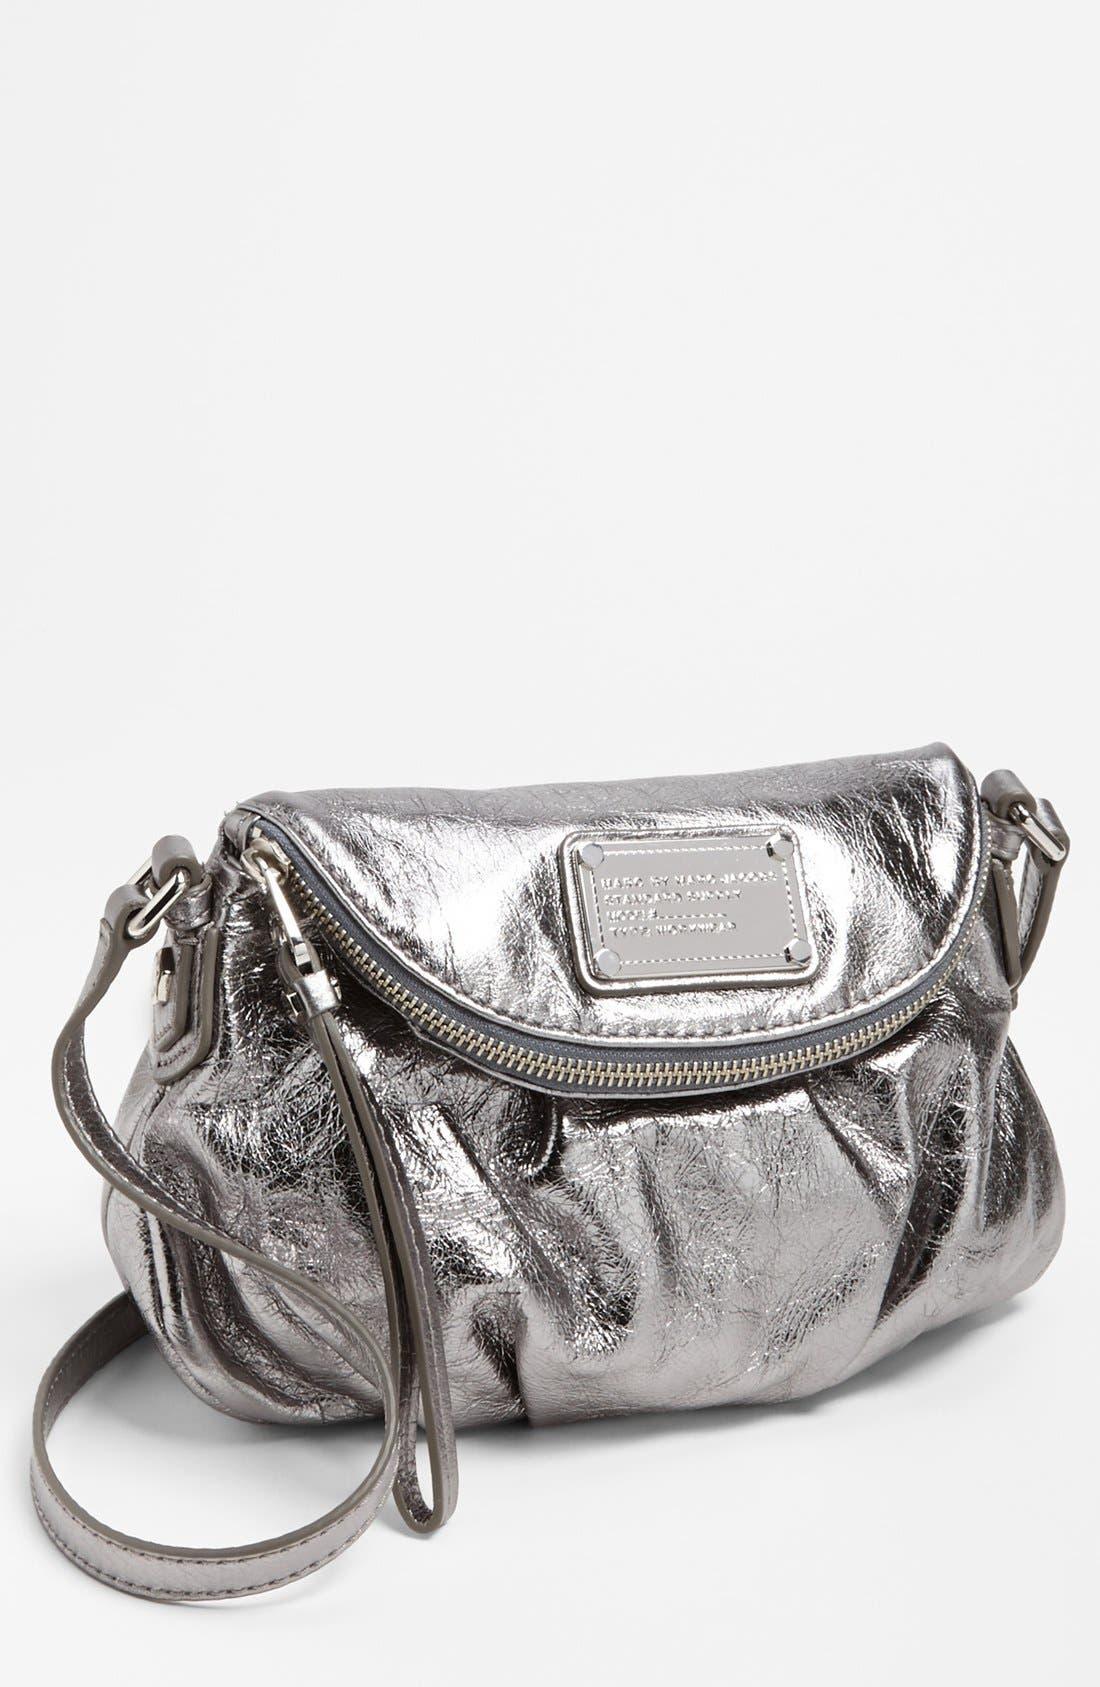 Alternate Image 1 Selected - MARC BY MARC JACOBS 'Classic Q Natasha - Mini' Crossbody Flap Bag